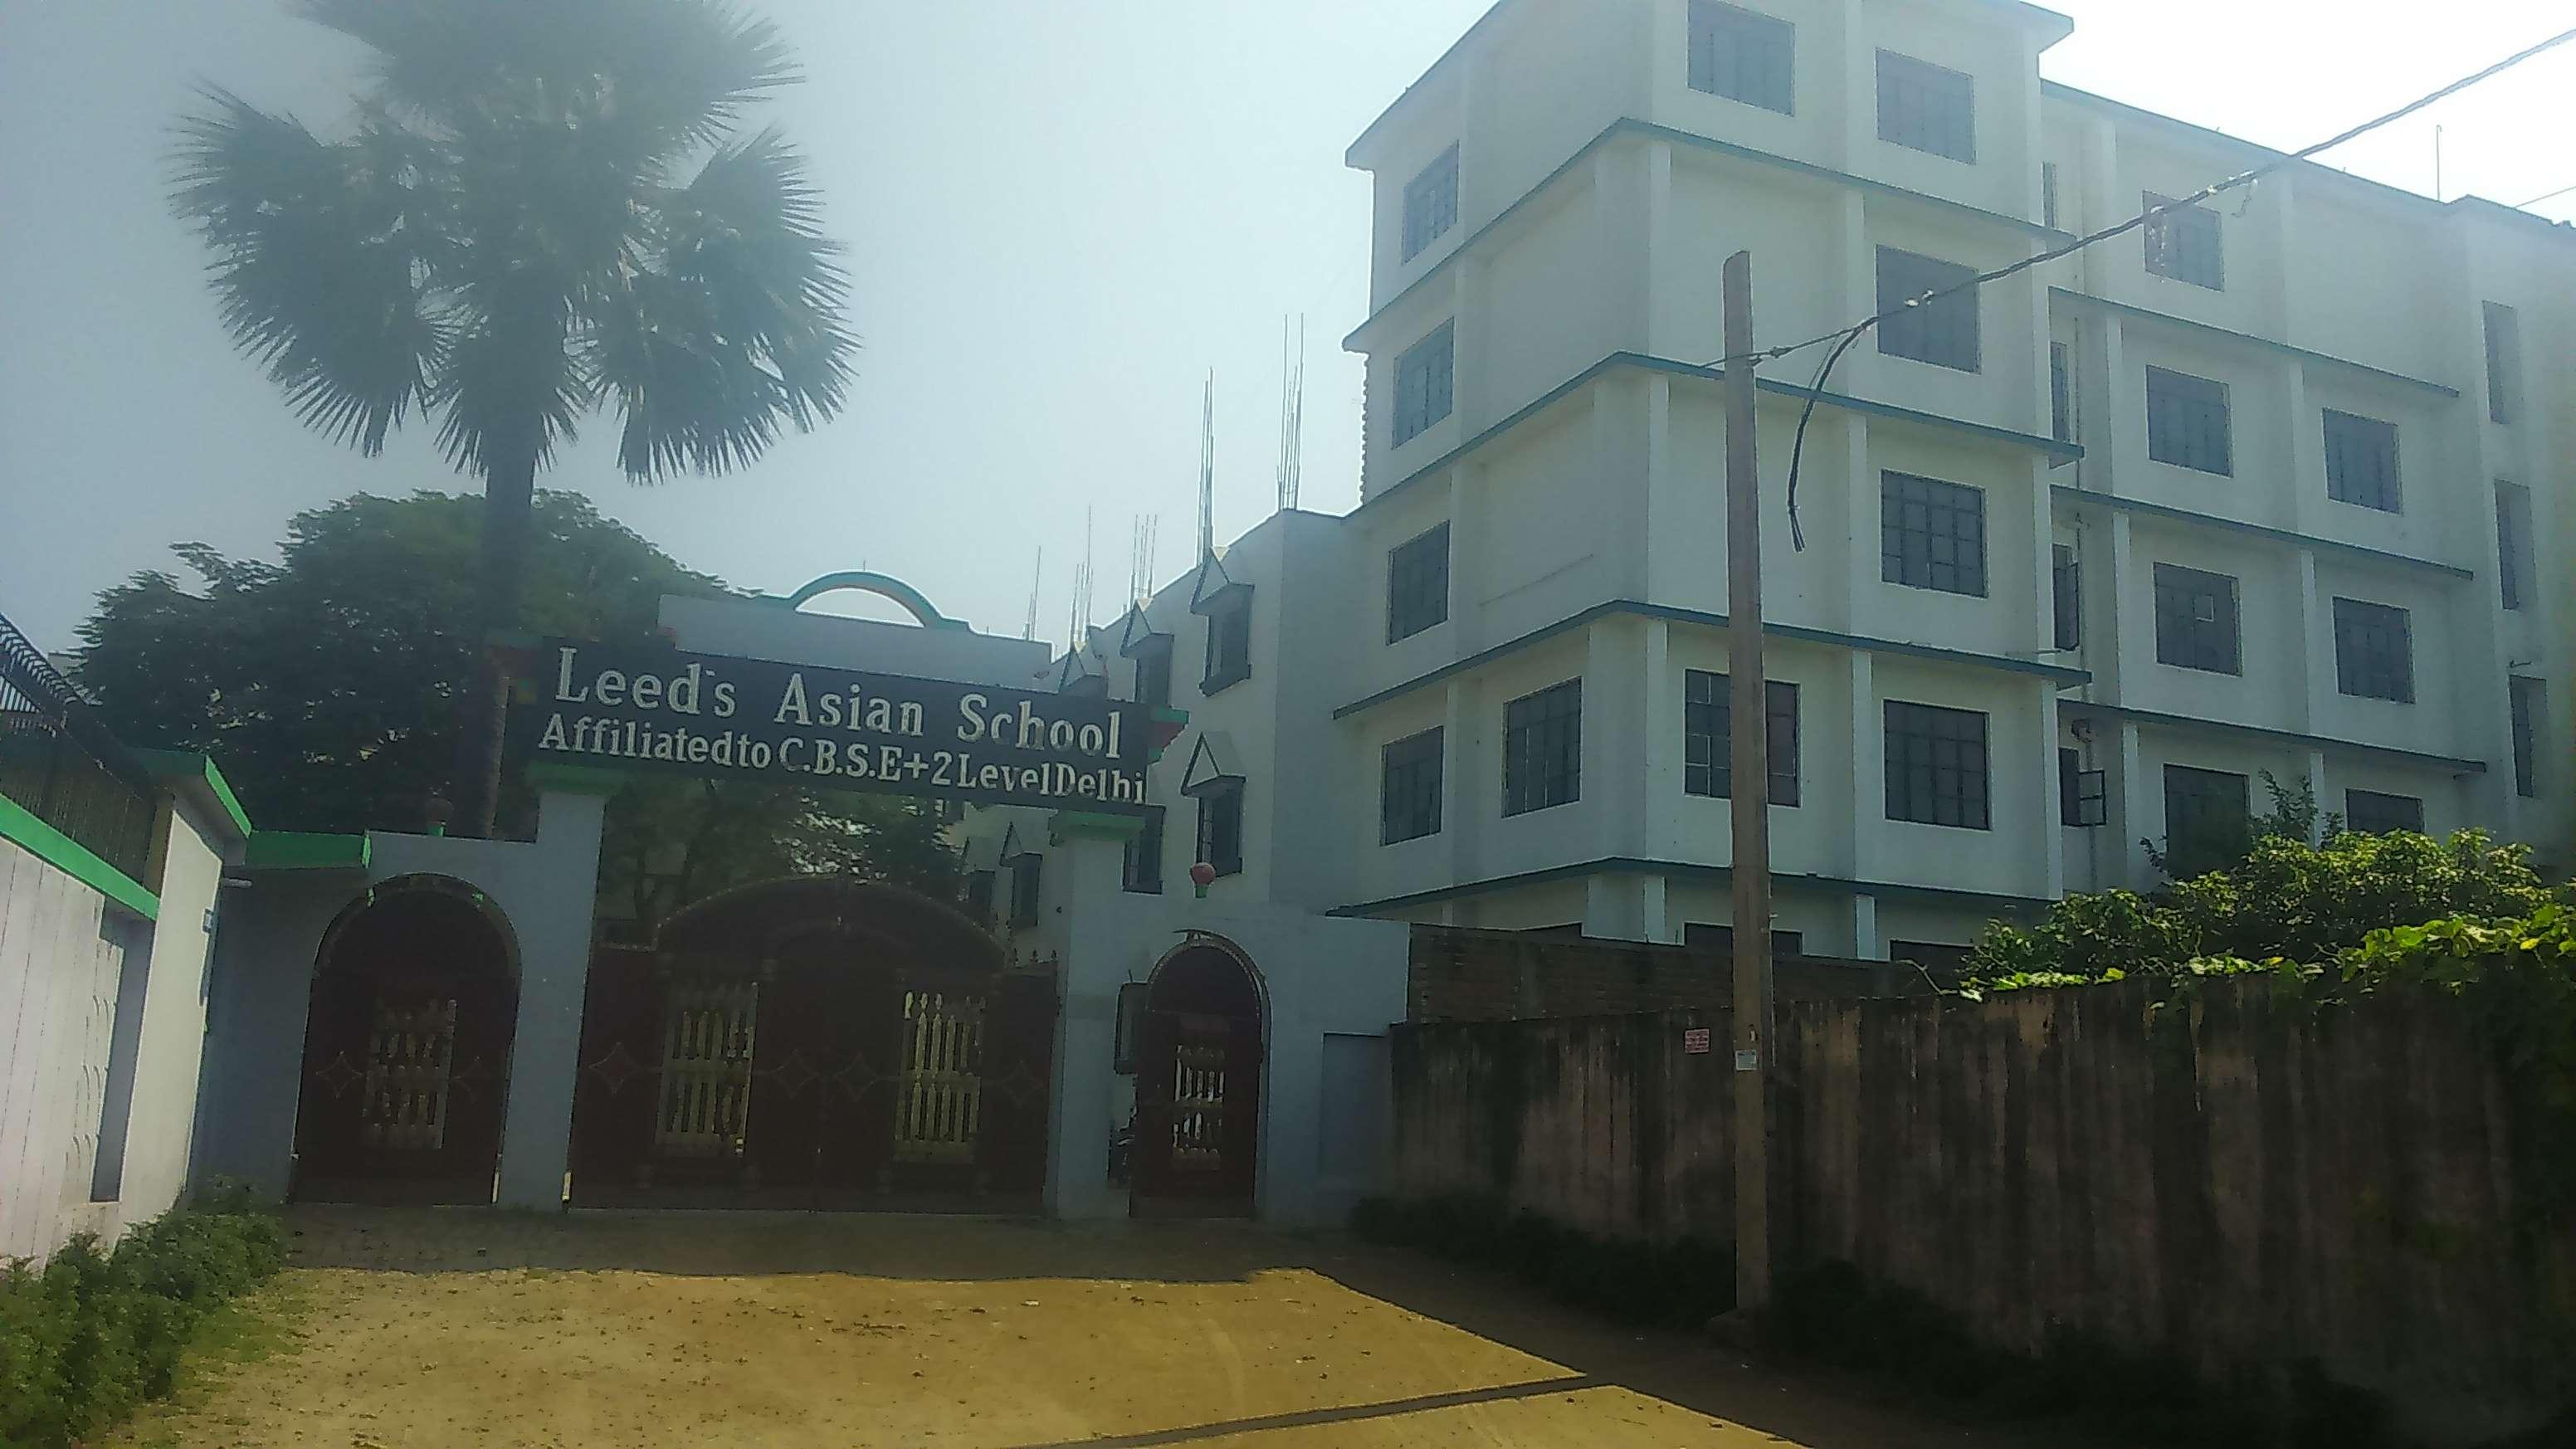 LEEDS ASIAN SCHOOL ASIAN ACRES NAHAR CHOWK BAILY ROAD PO DANAPUR CANTT PATNA BIHAR 330131